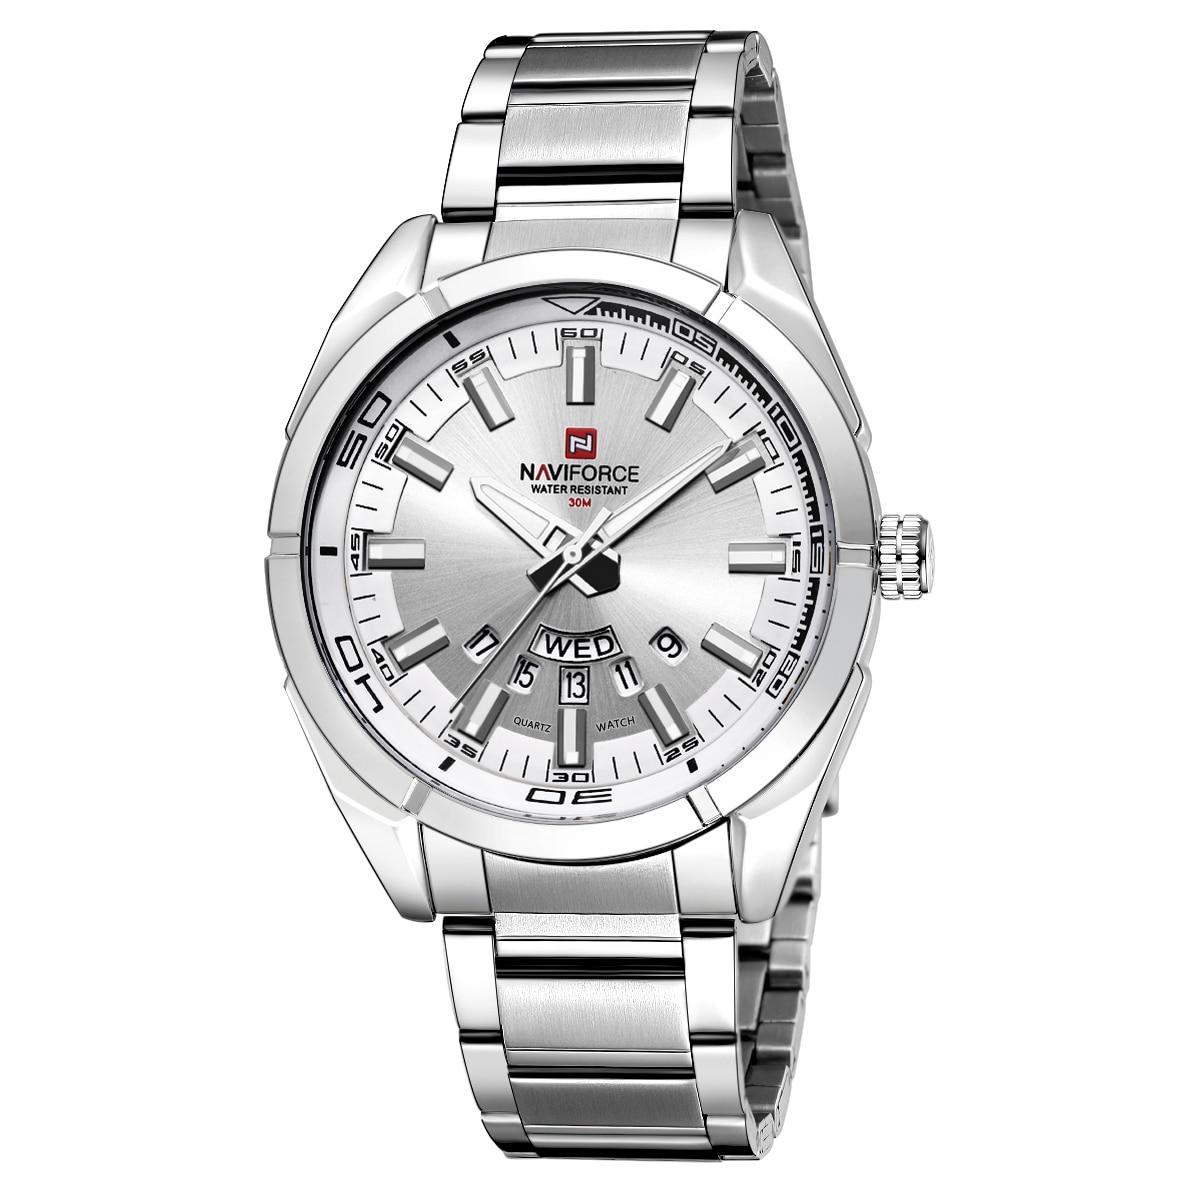 NAVIFORCE Brand Men Watches Business Quartz Watch Men's Stainless Steel Band 30M Waterproof Date Wristwatches Relogio Masculino 2